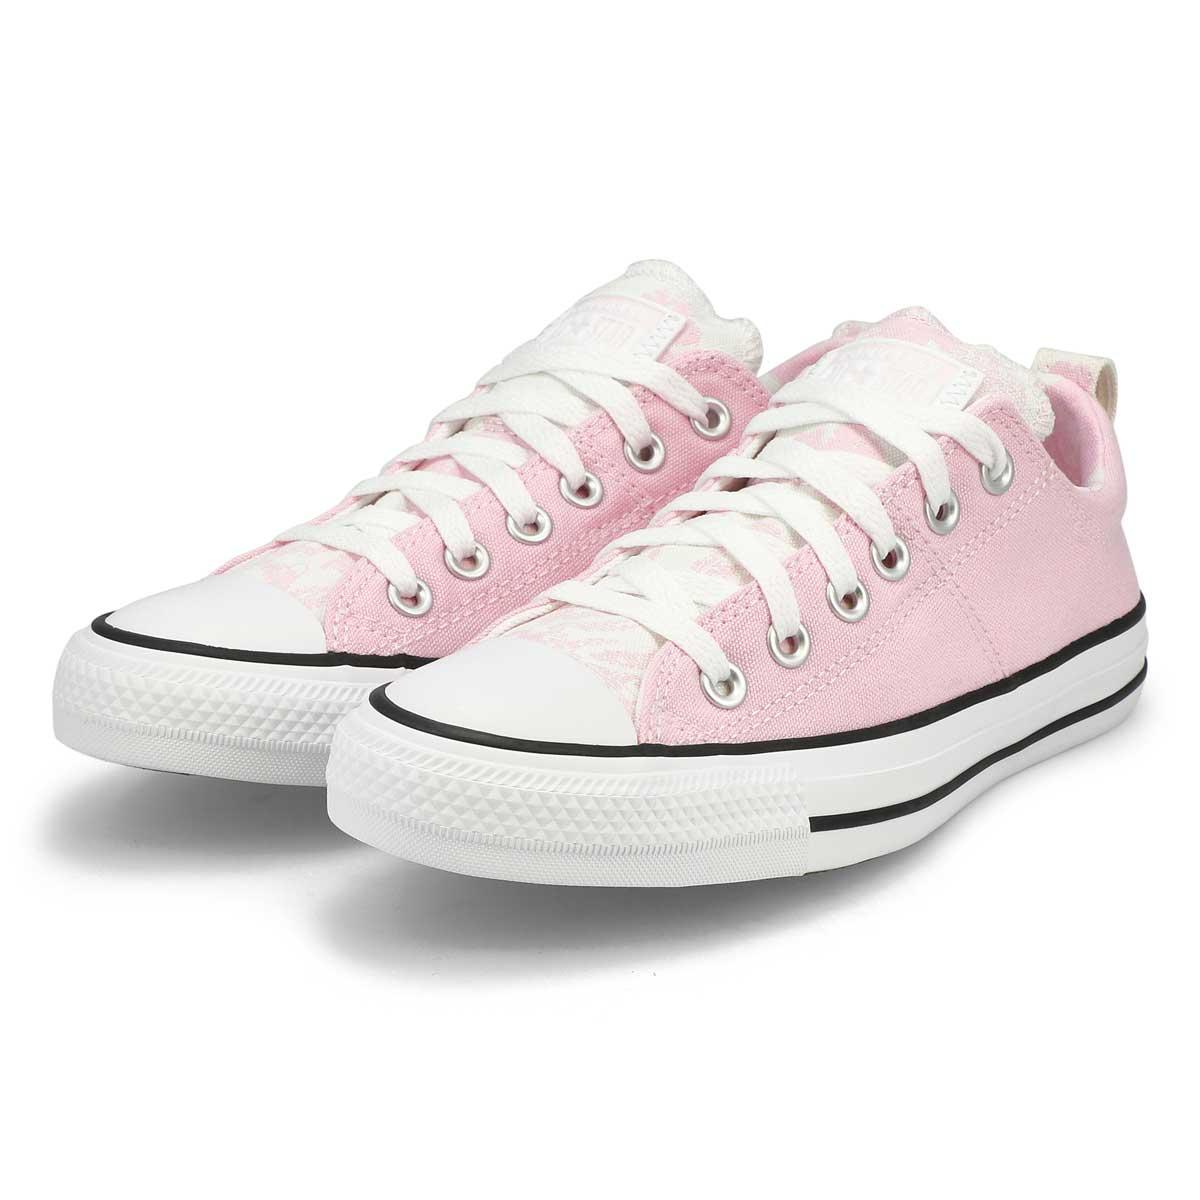 Women's All Star Madison Sneaker - Pink